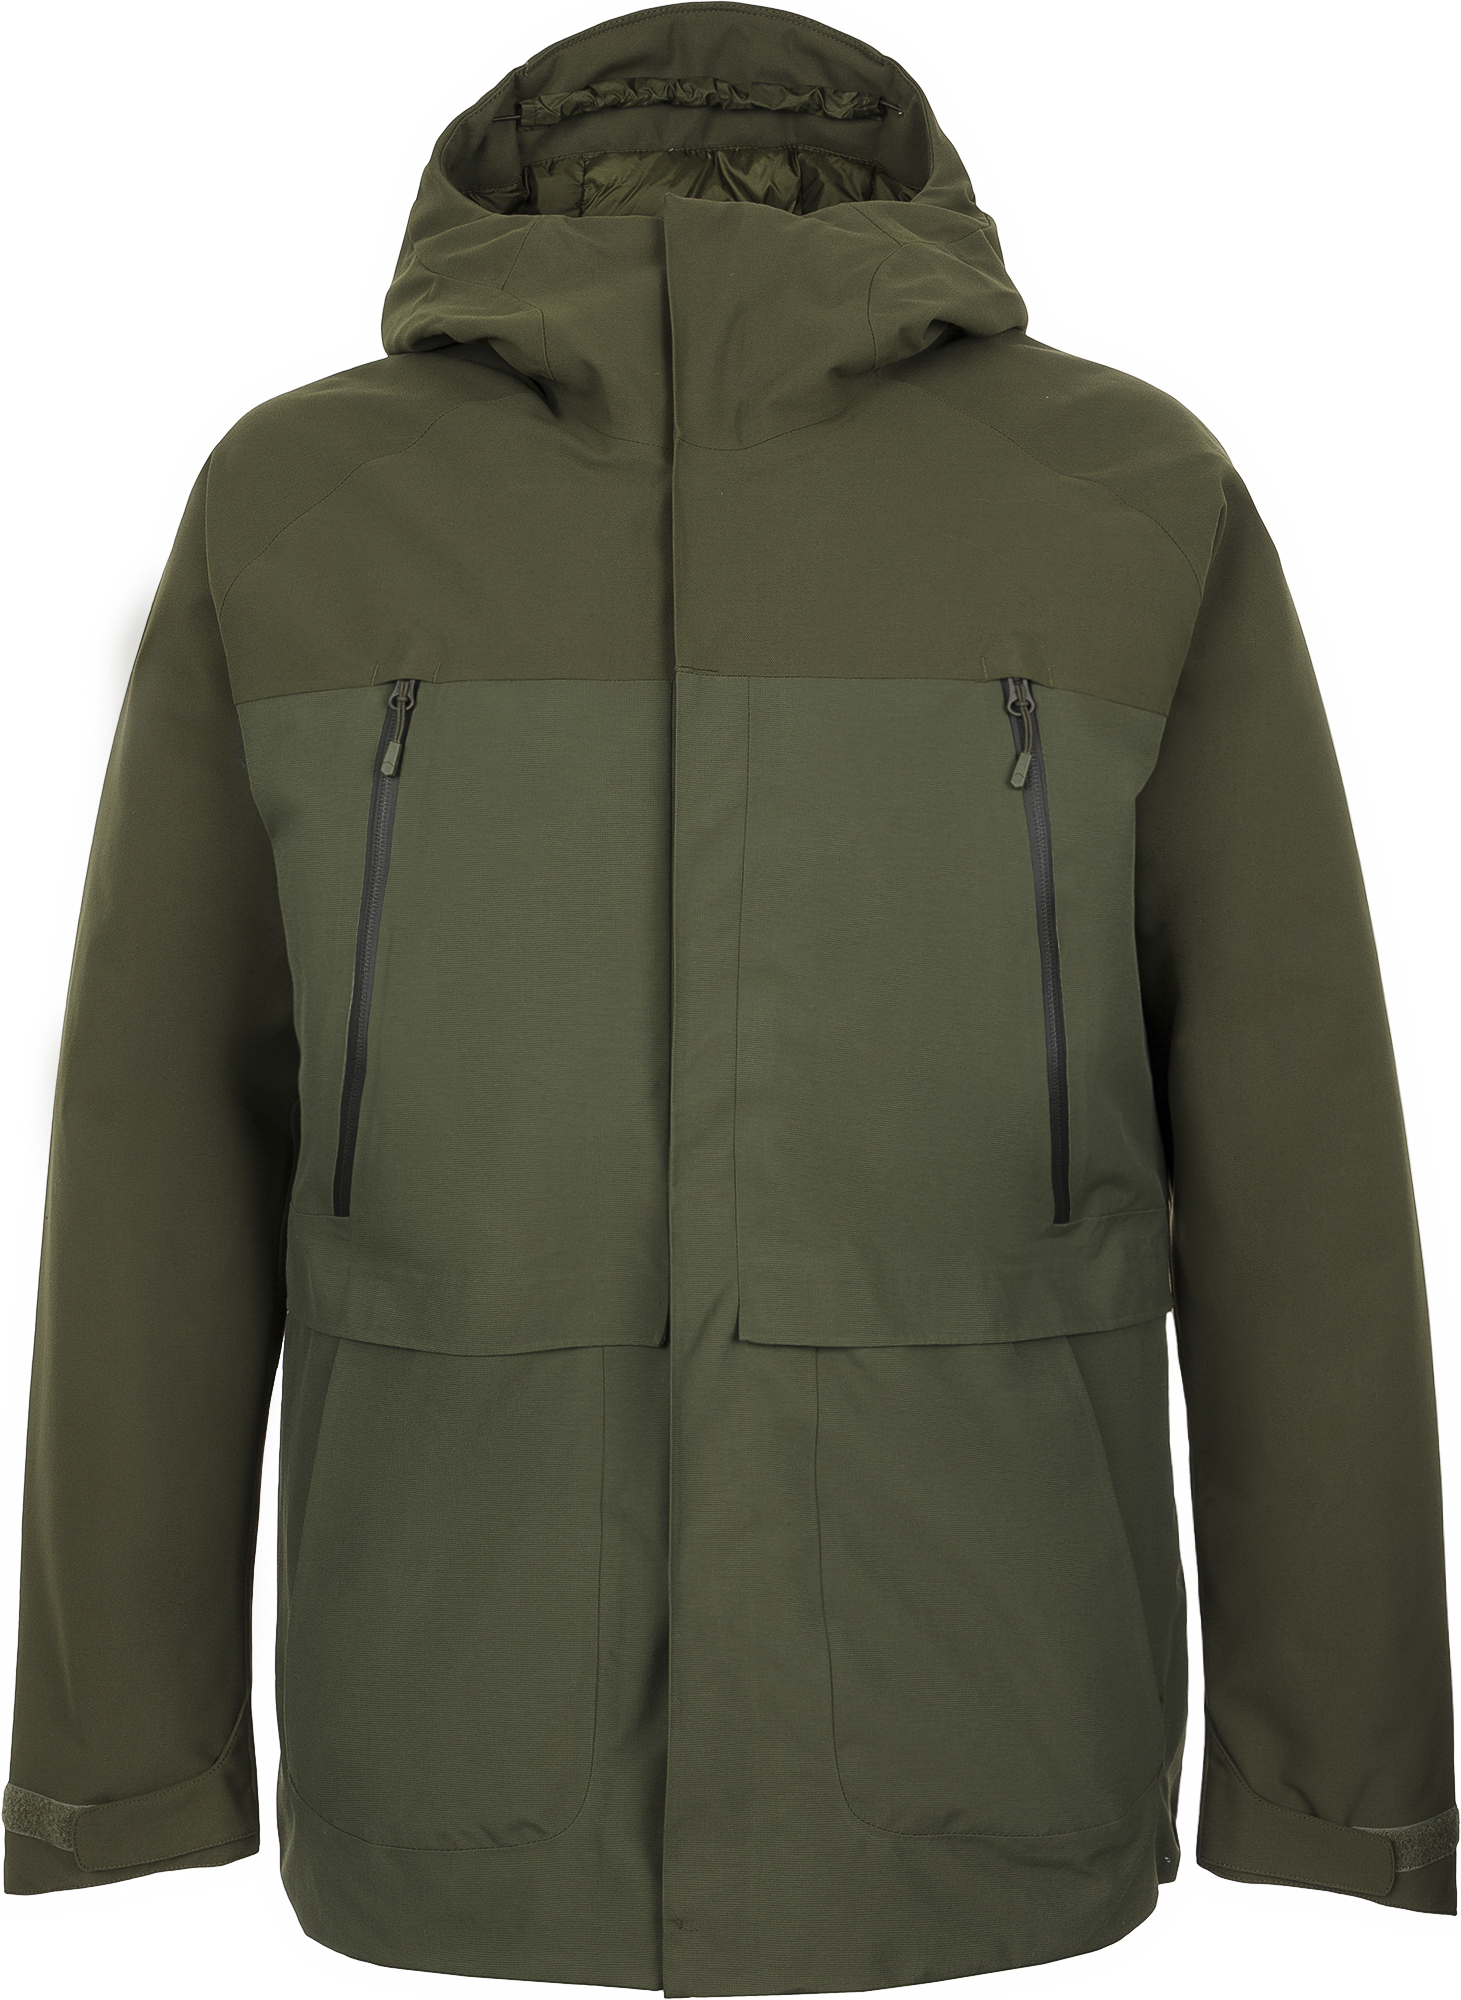 Mountain Hardwear Куртка утепленная мужская Summit Shadow™ Gore-Tex®, размер 56